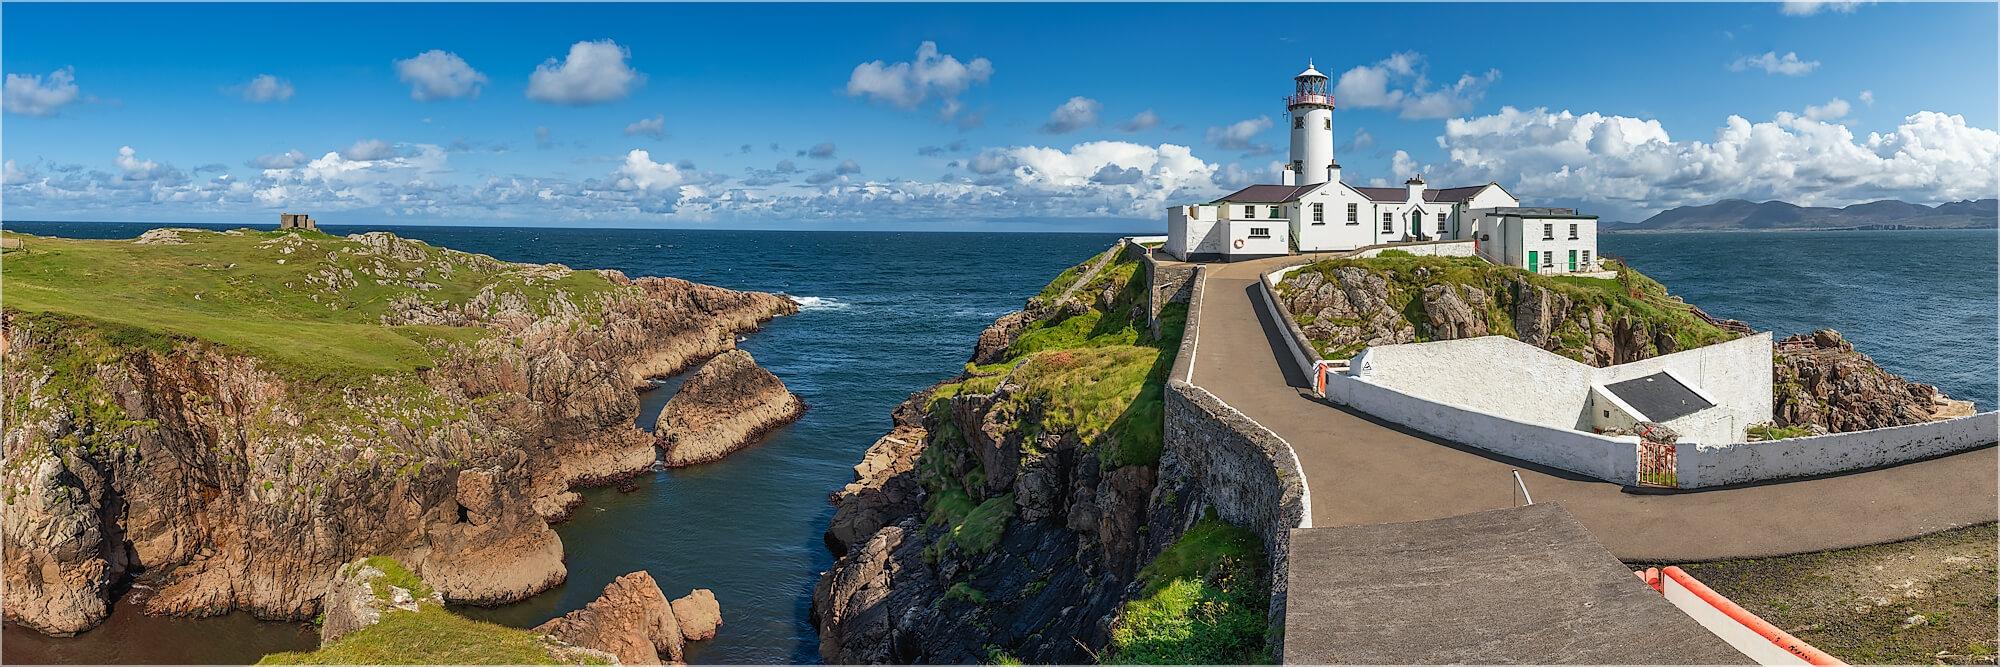 Panoramabild Leuchtturm Fanad Head Donegal Irland